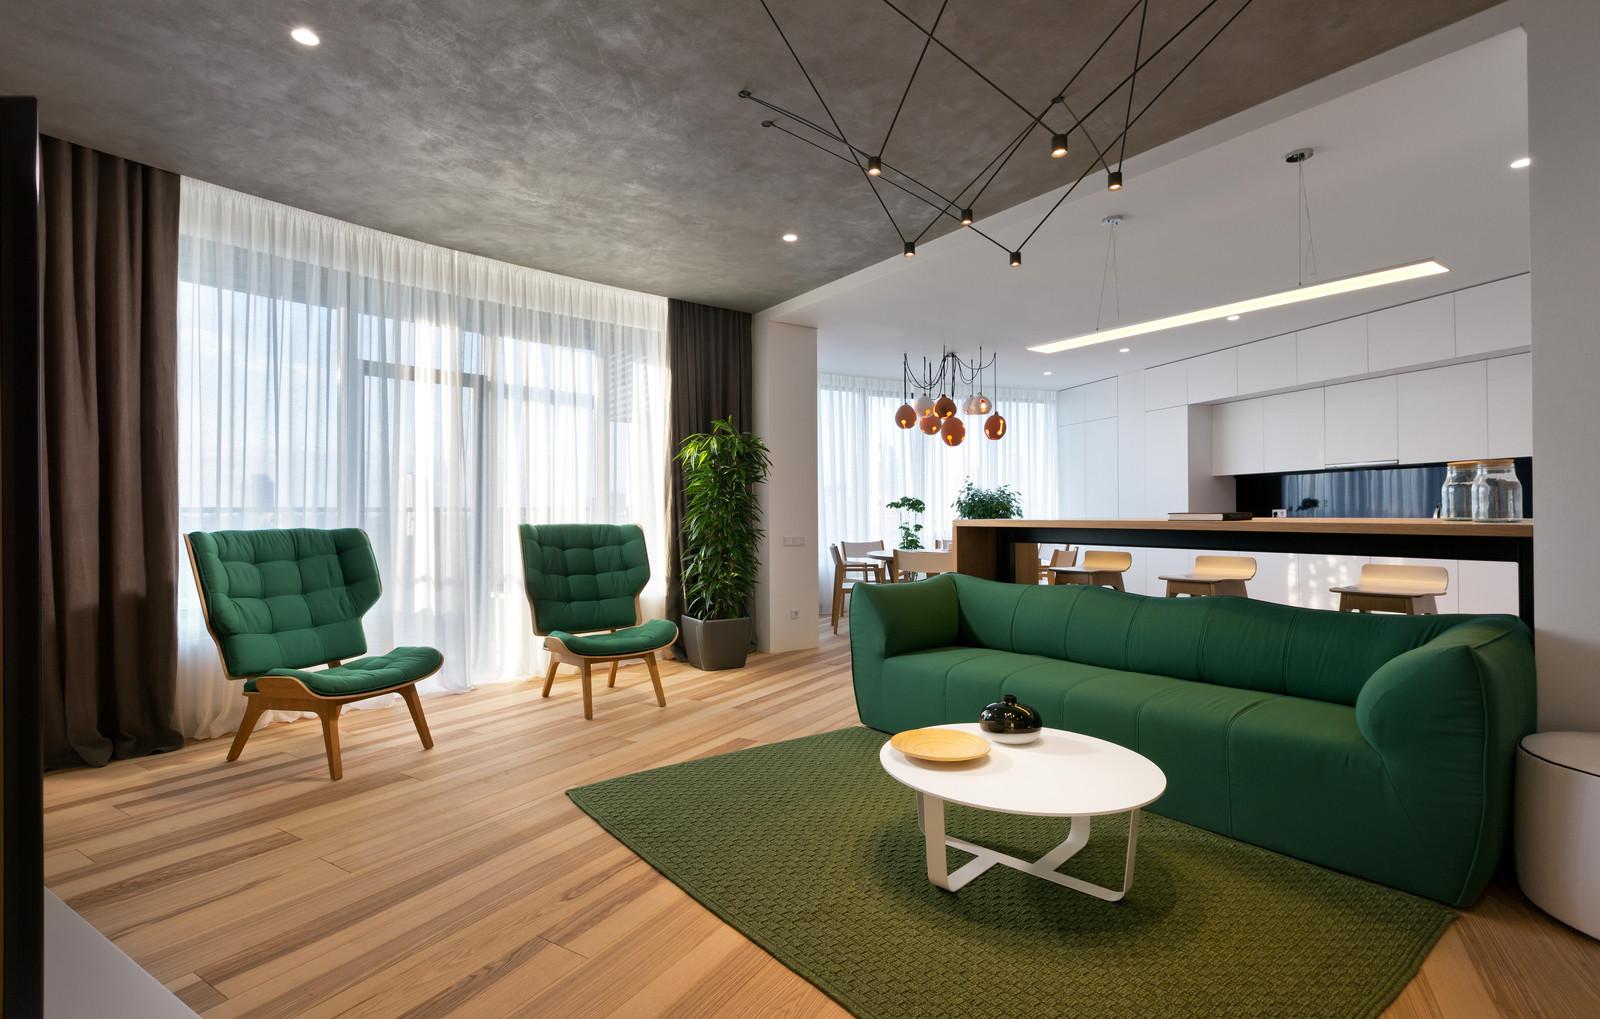 Однокомнатная квартира 40 кв м зеленая